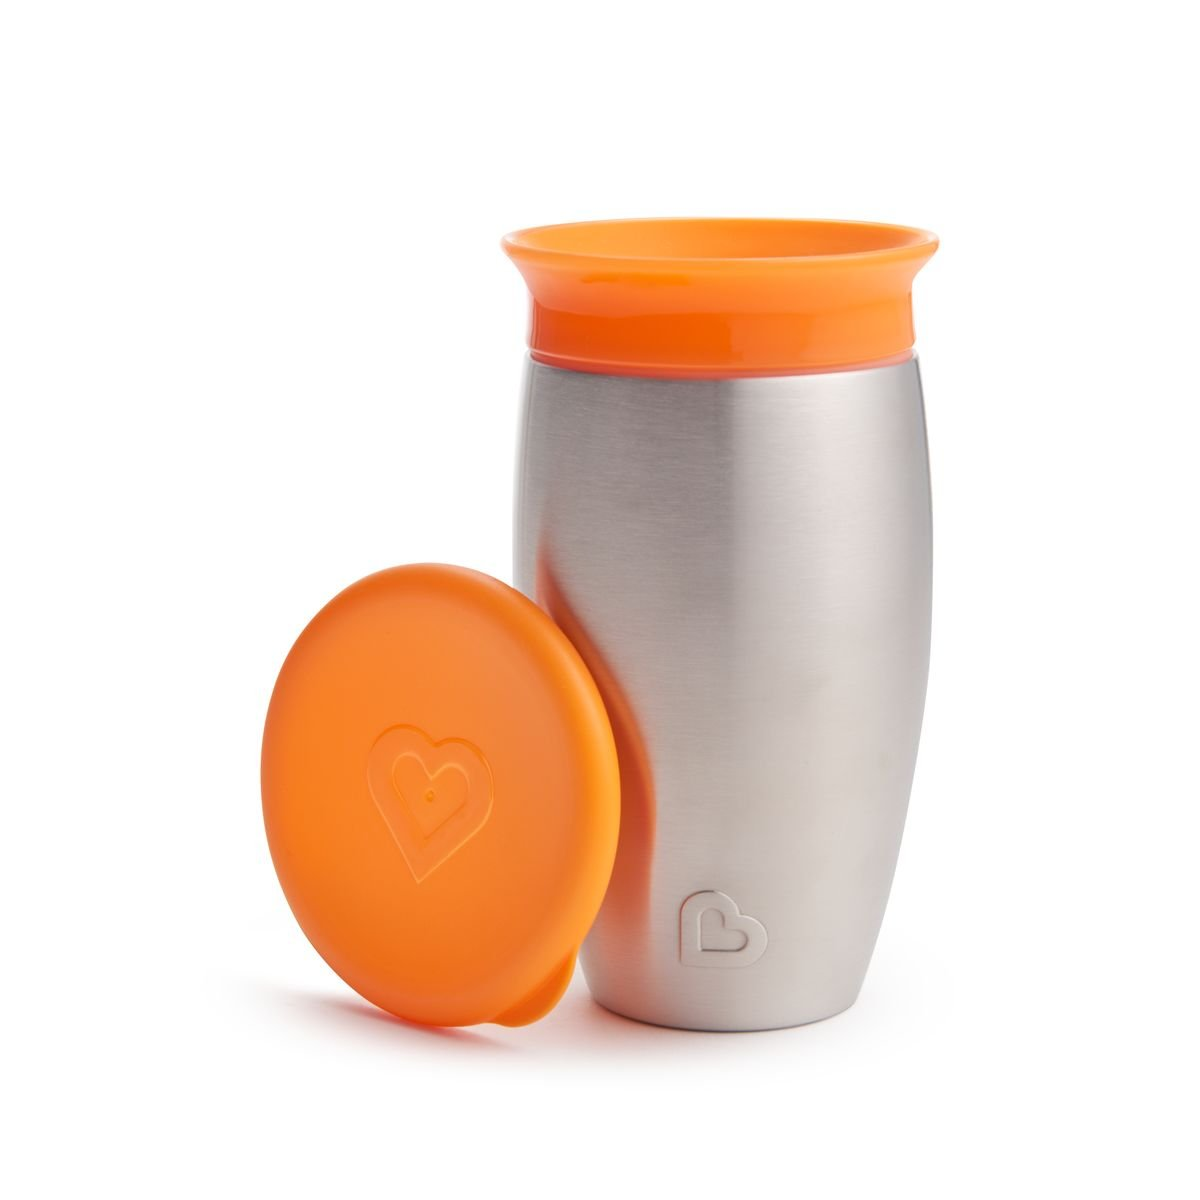 Orange Edelstahl//orange Munchkin Miracle 360ᵒ Edelstahl-Trinkbecher 296 ml